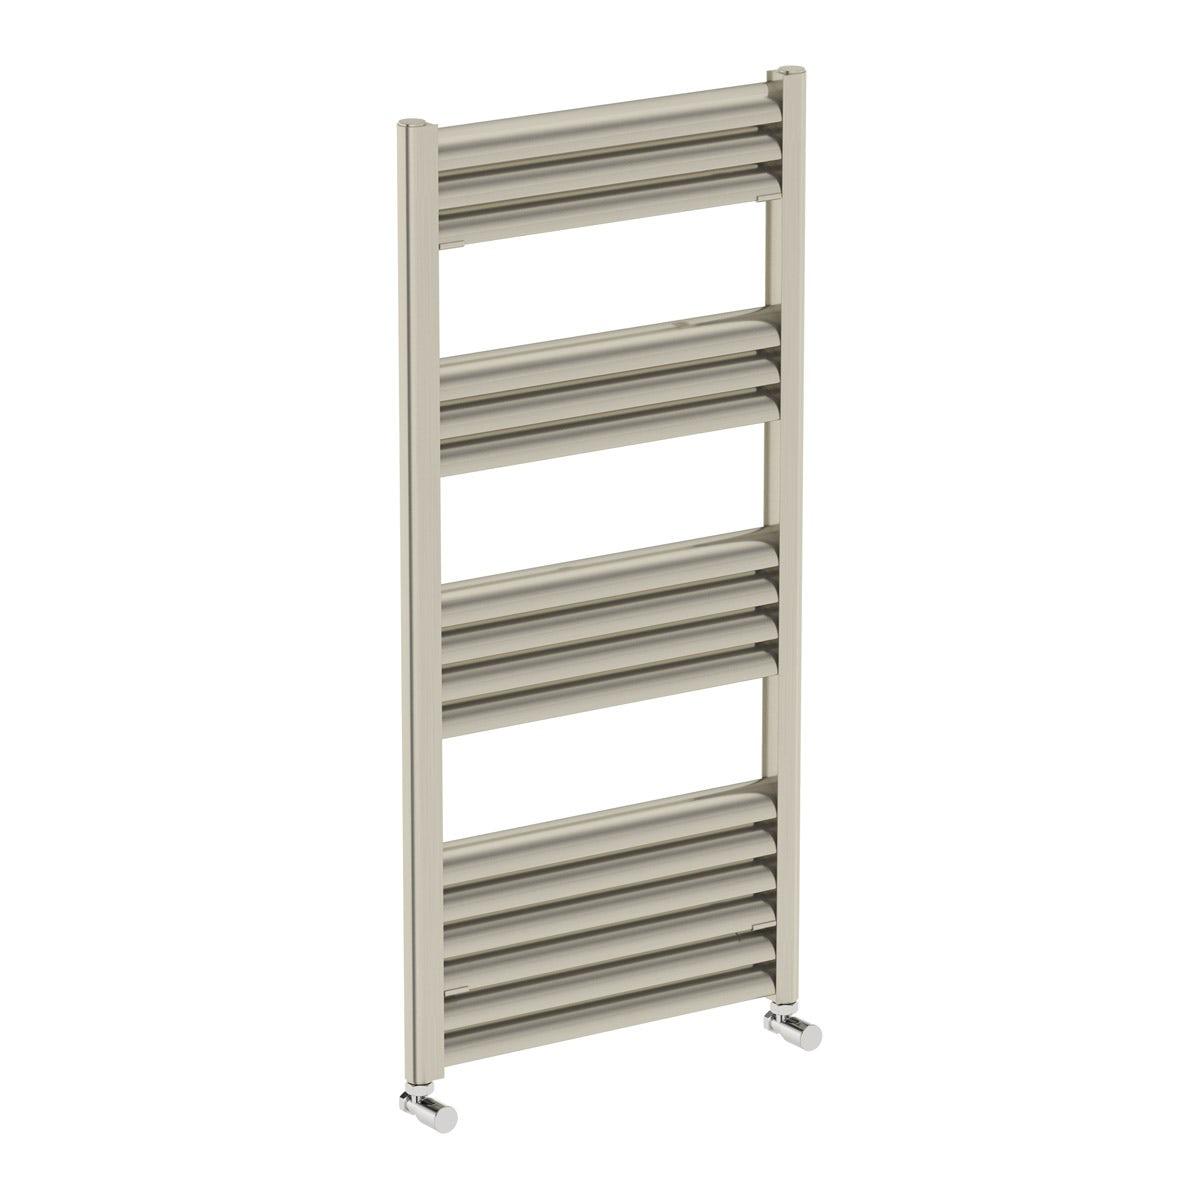 Mode Carter heated towel rail 1020 x 500